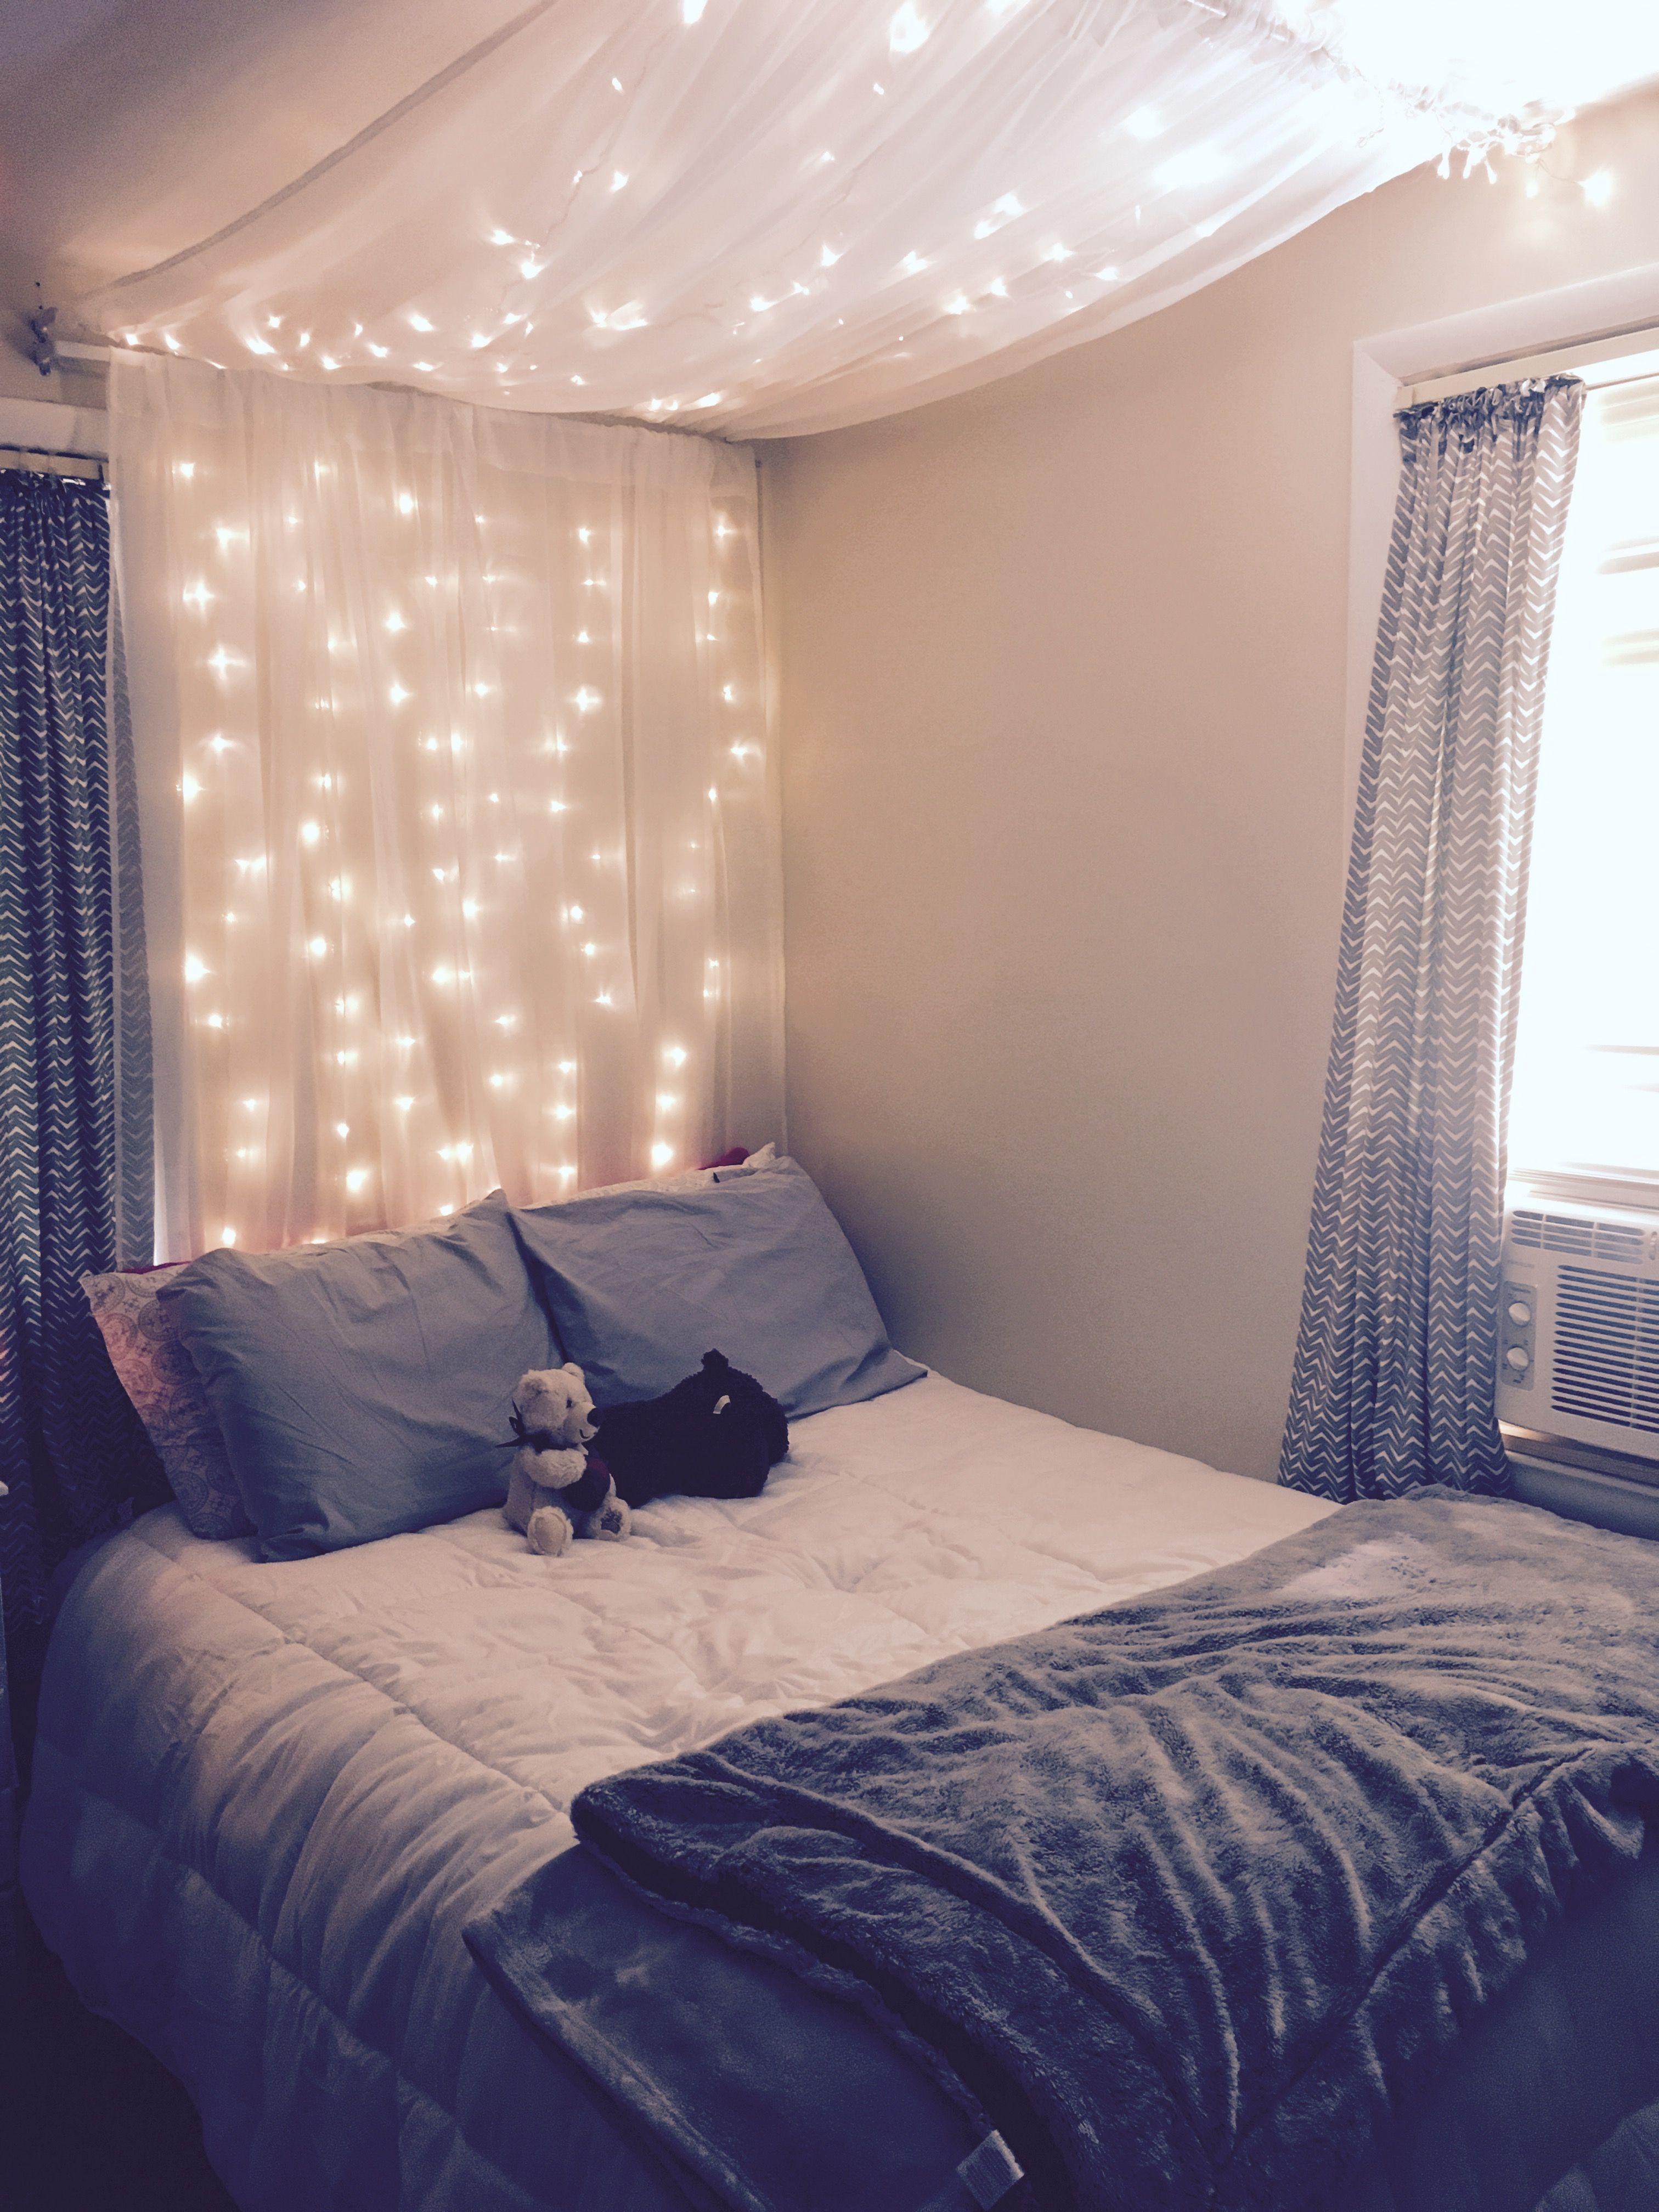 Creative bedroom decor ideas  creative and simple diy bedroom canopy ideas on a budget